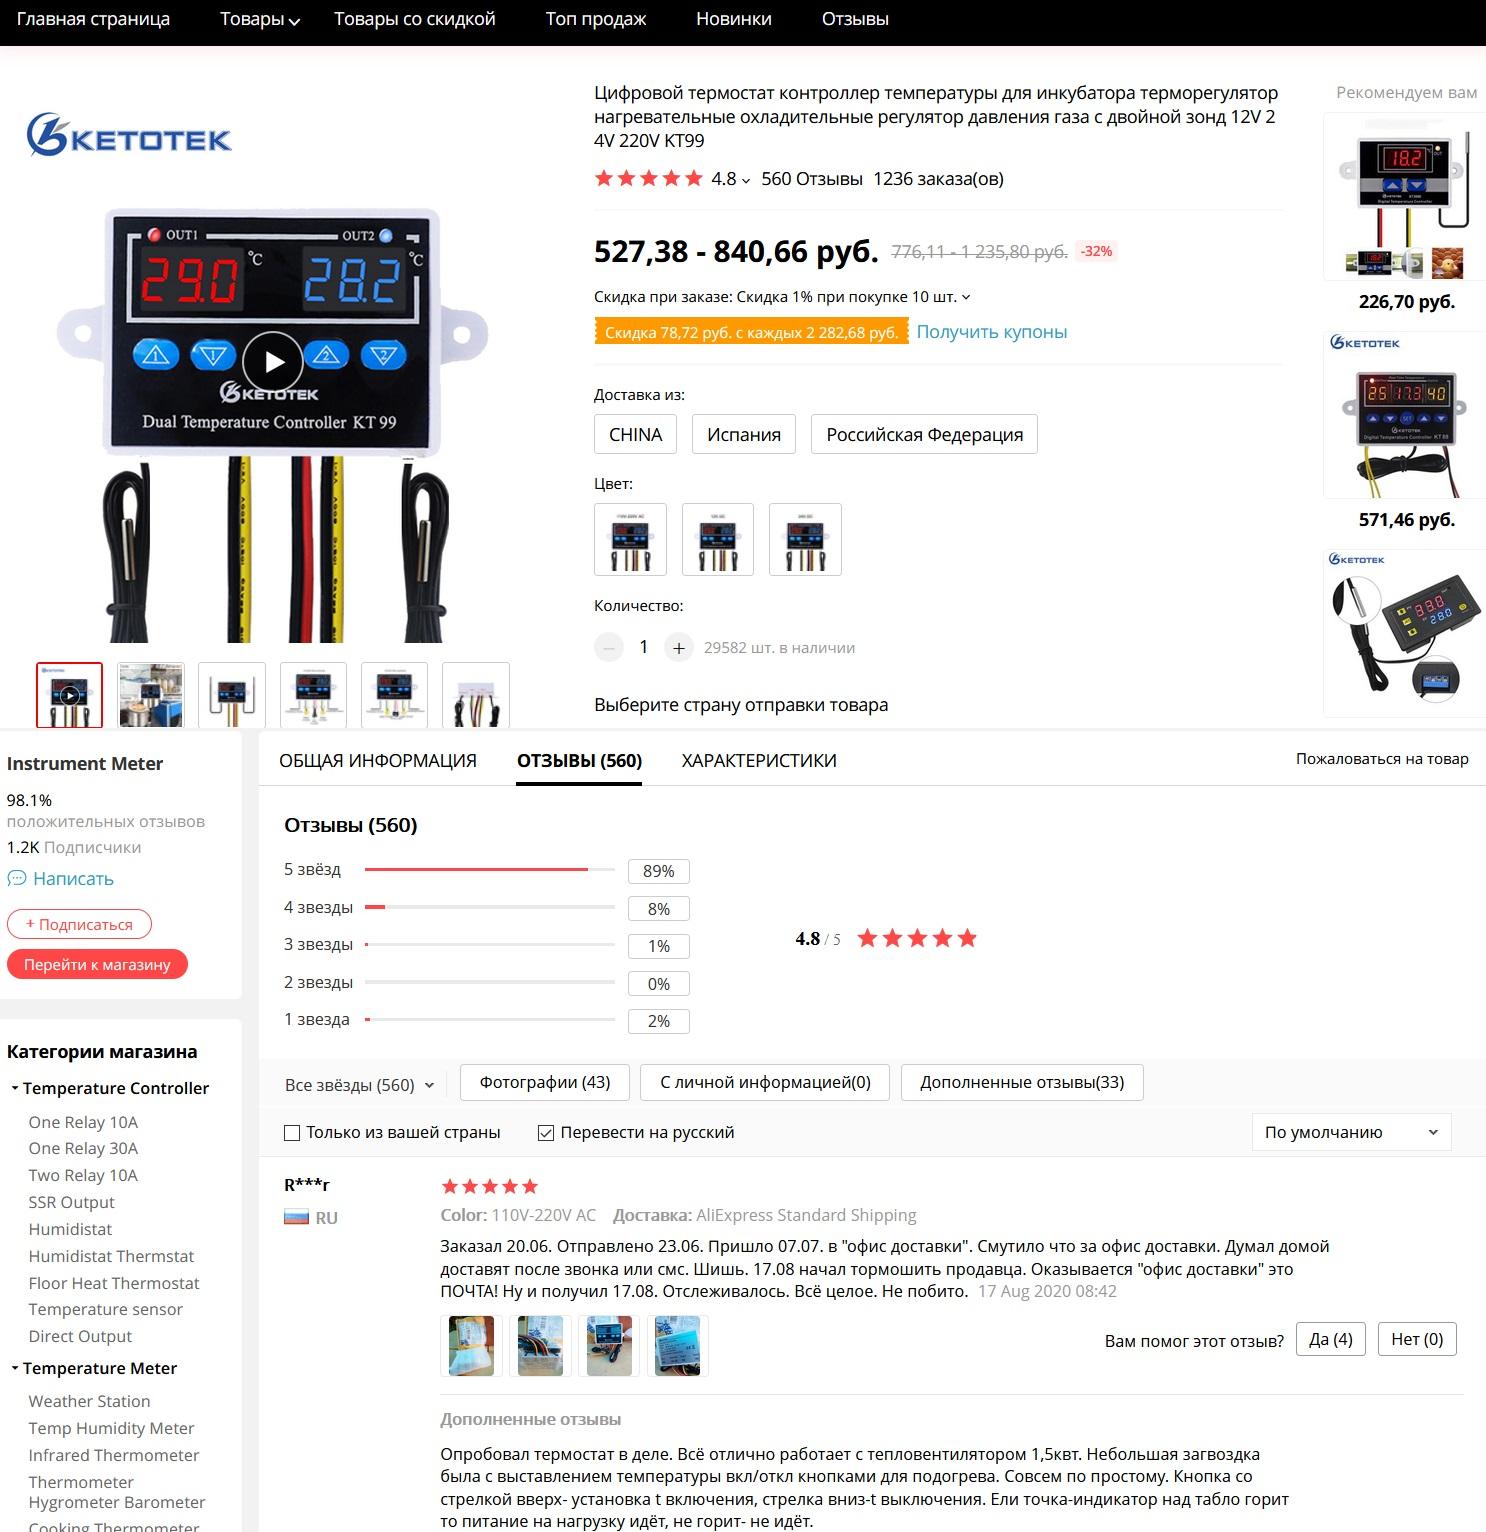 Терморегулятор KETOTEK KT99 Thermostat